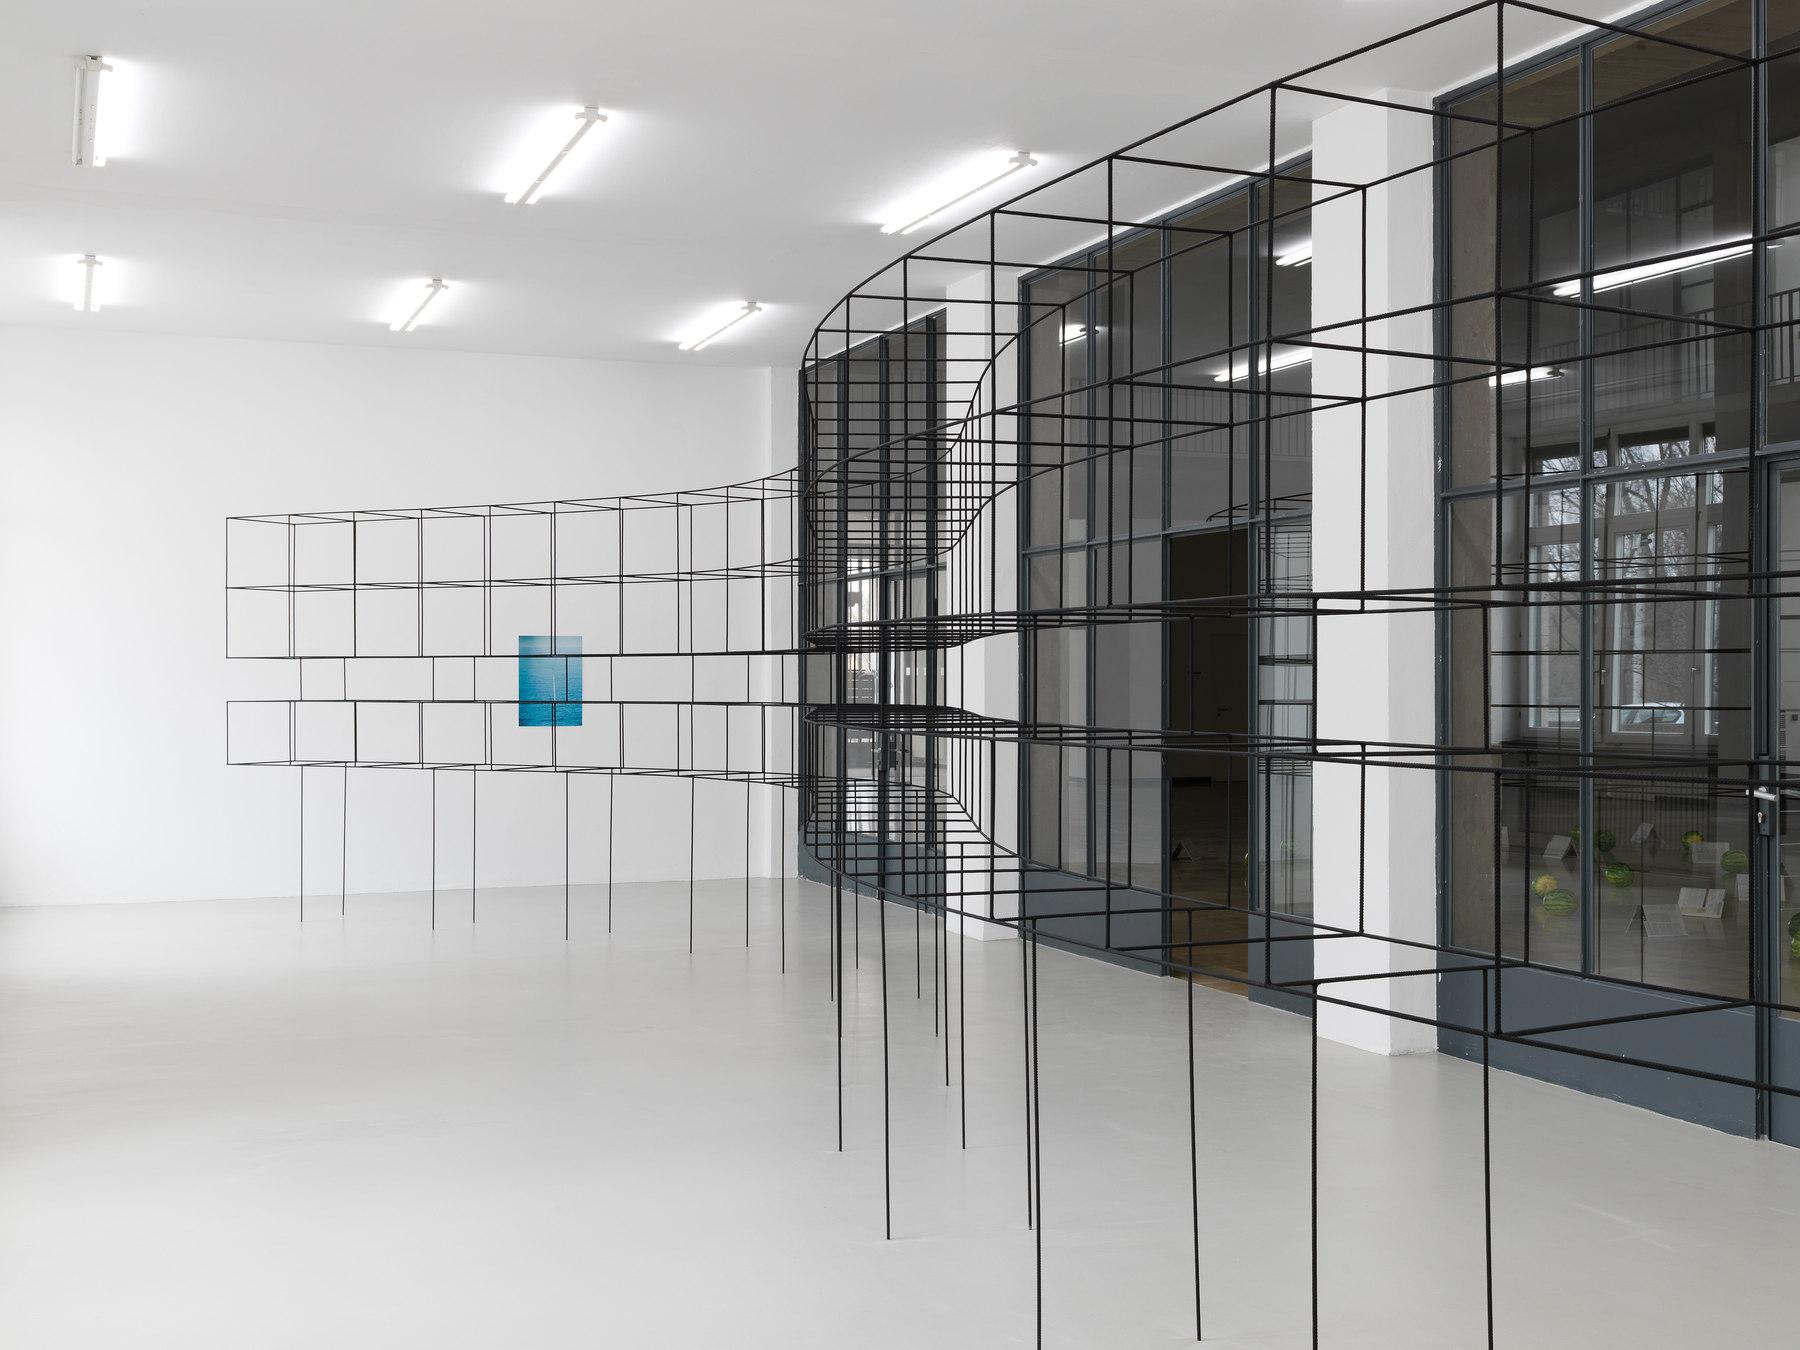 04_Edit Oderbolz_Kunstverein Nürnberg_2017